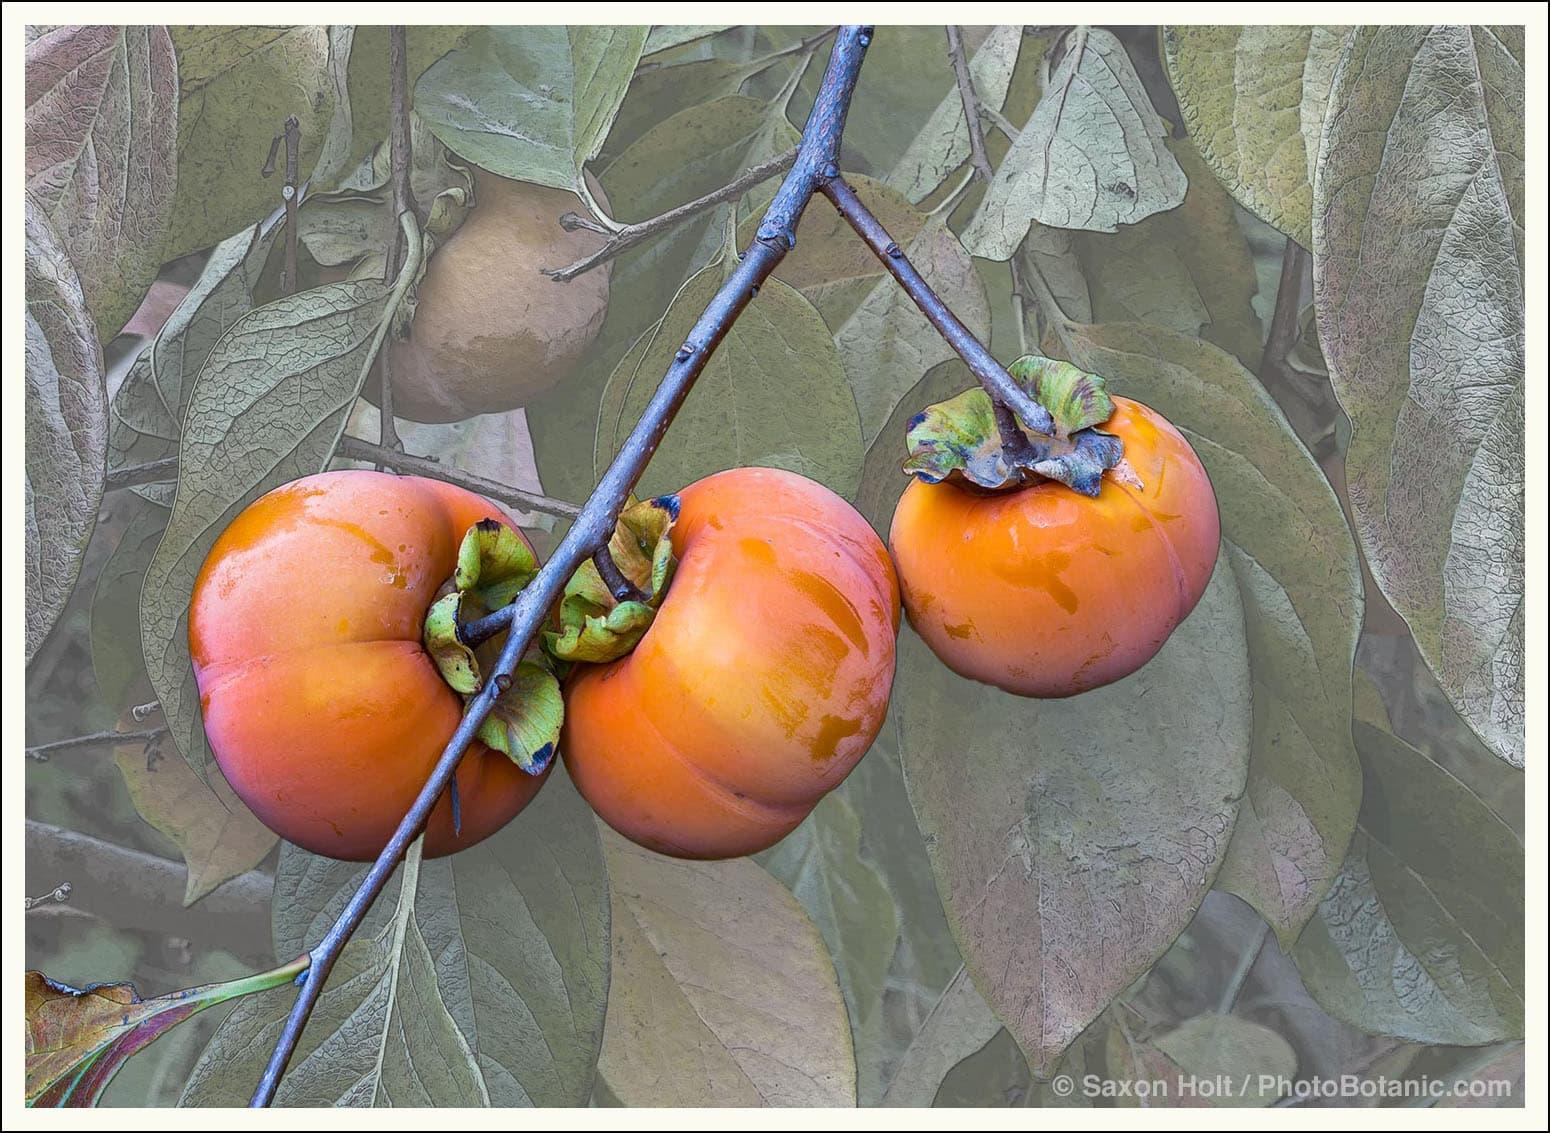 Fuyu Persimmon ripening on tree in California garden